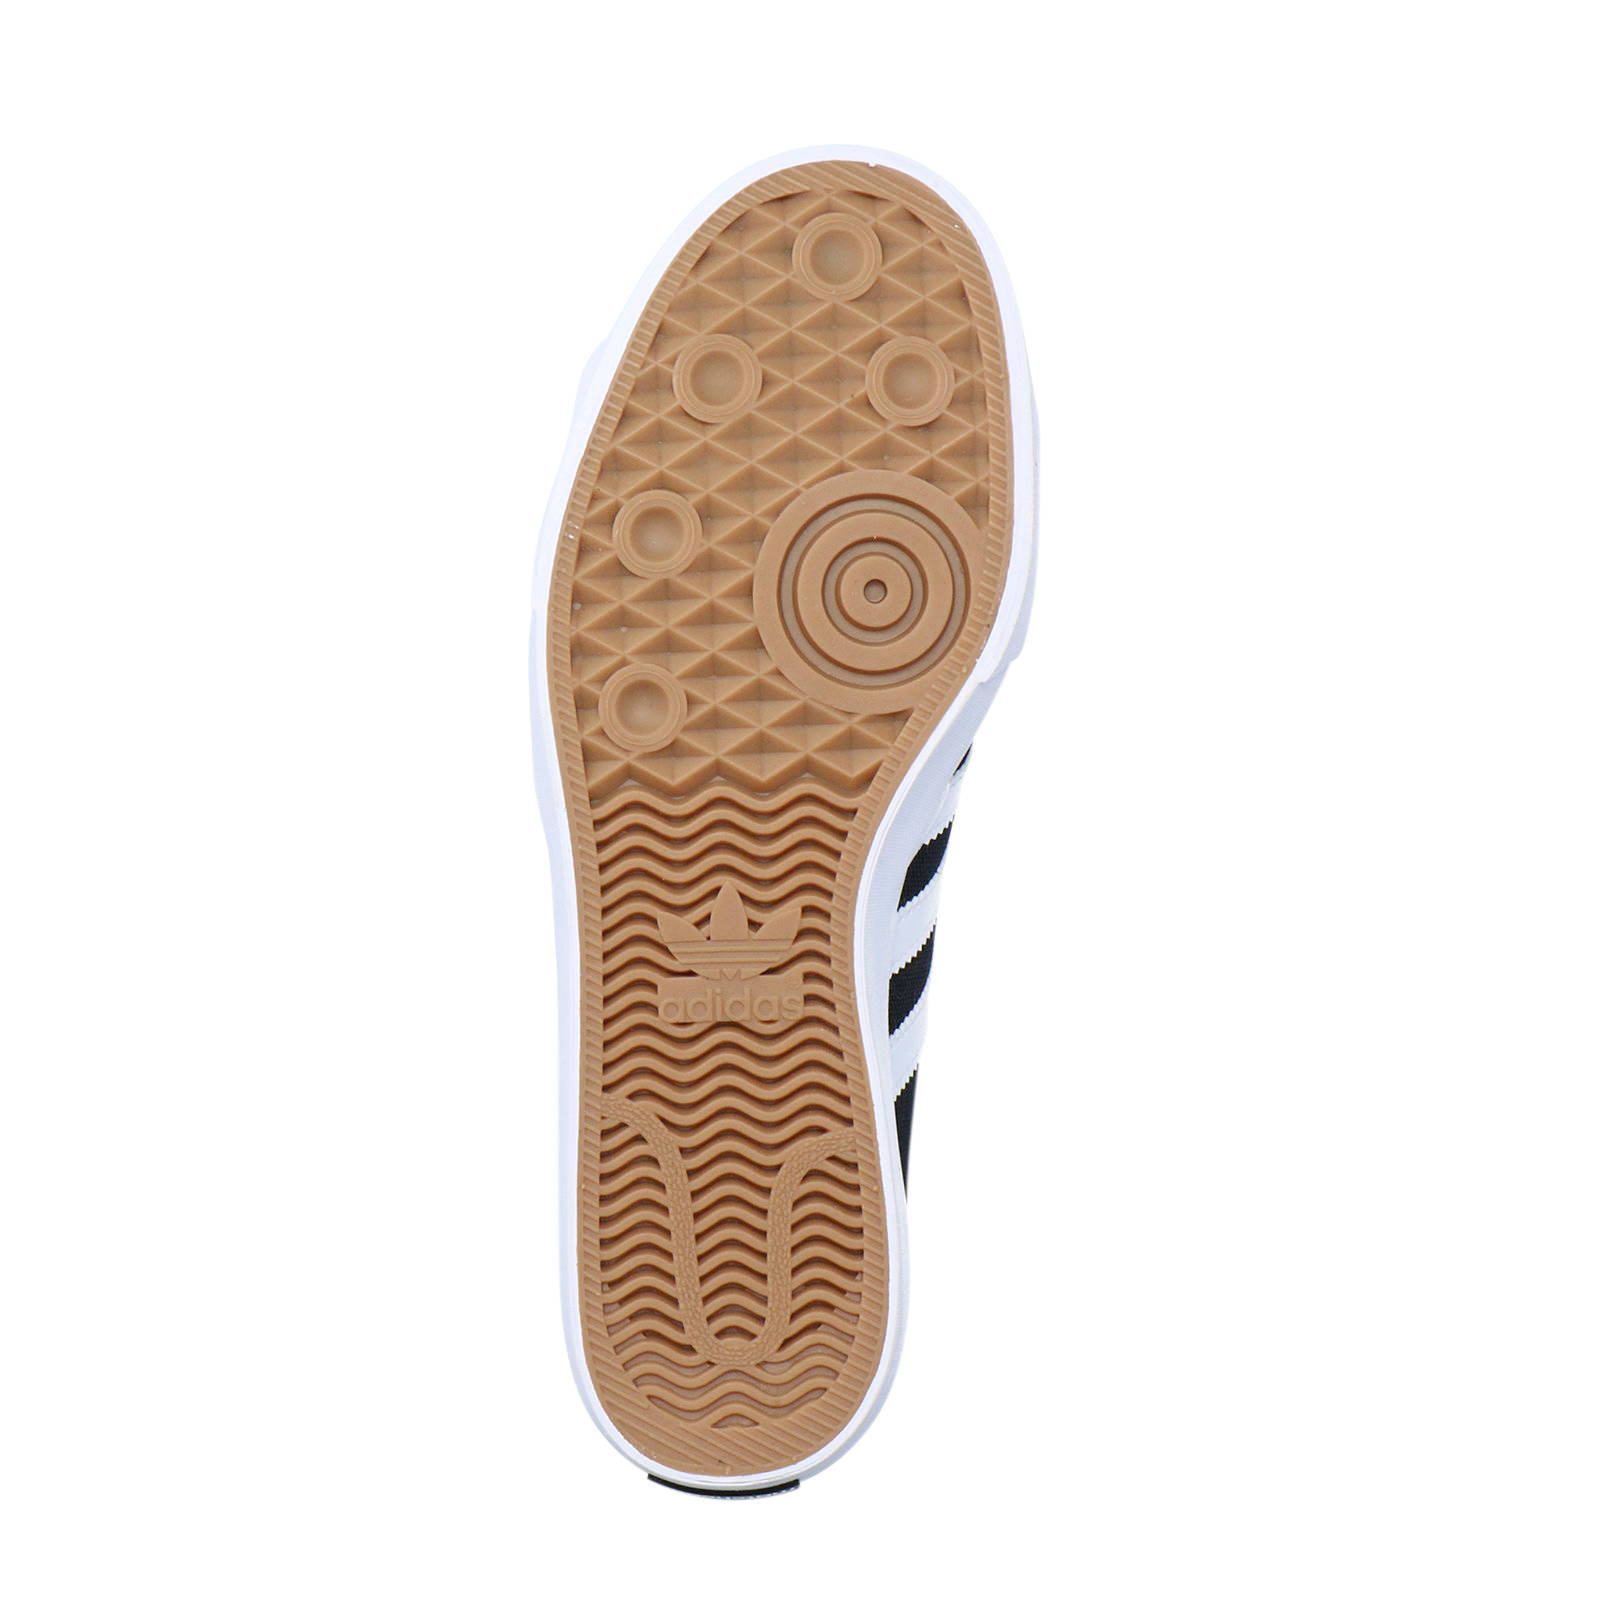 Matchcourt sneakers wit originals adidas RX zwart C4wq5tnx